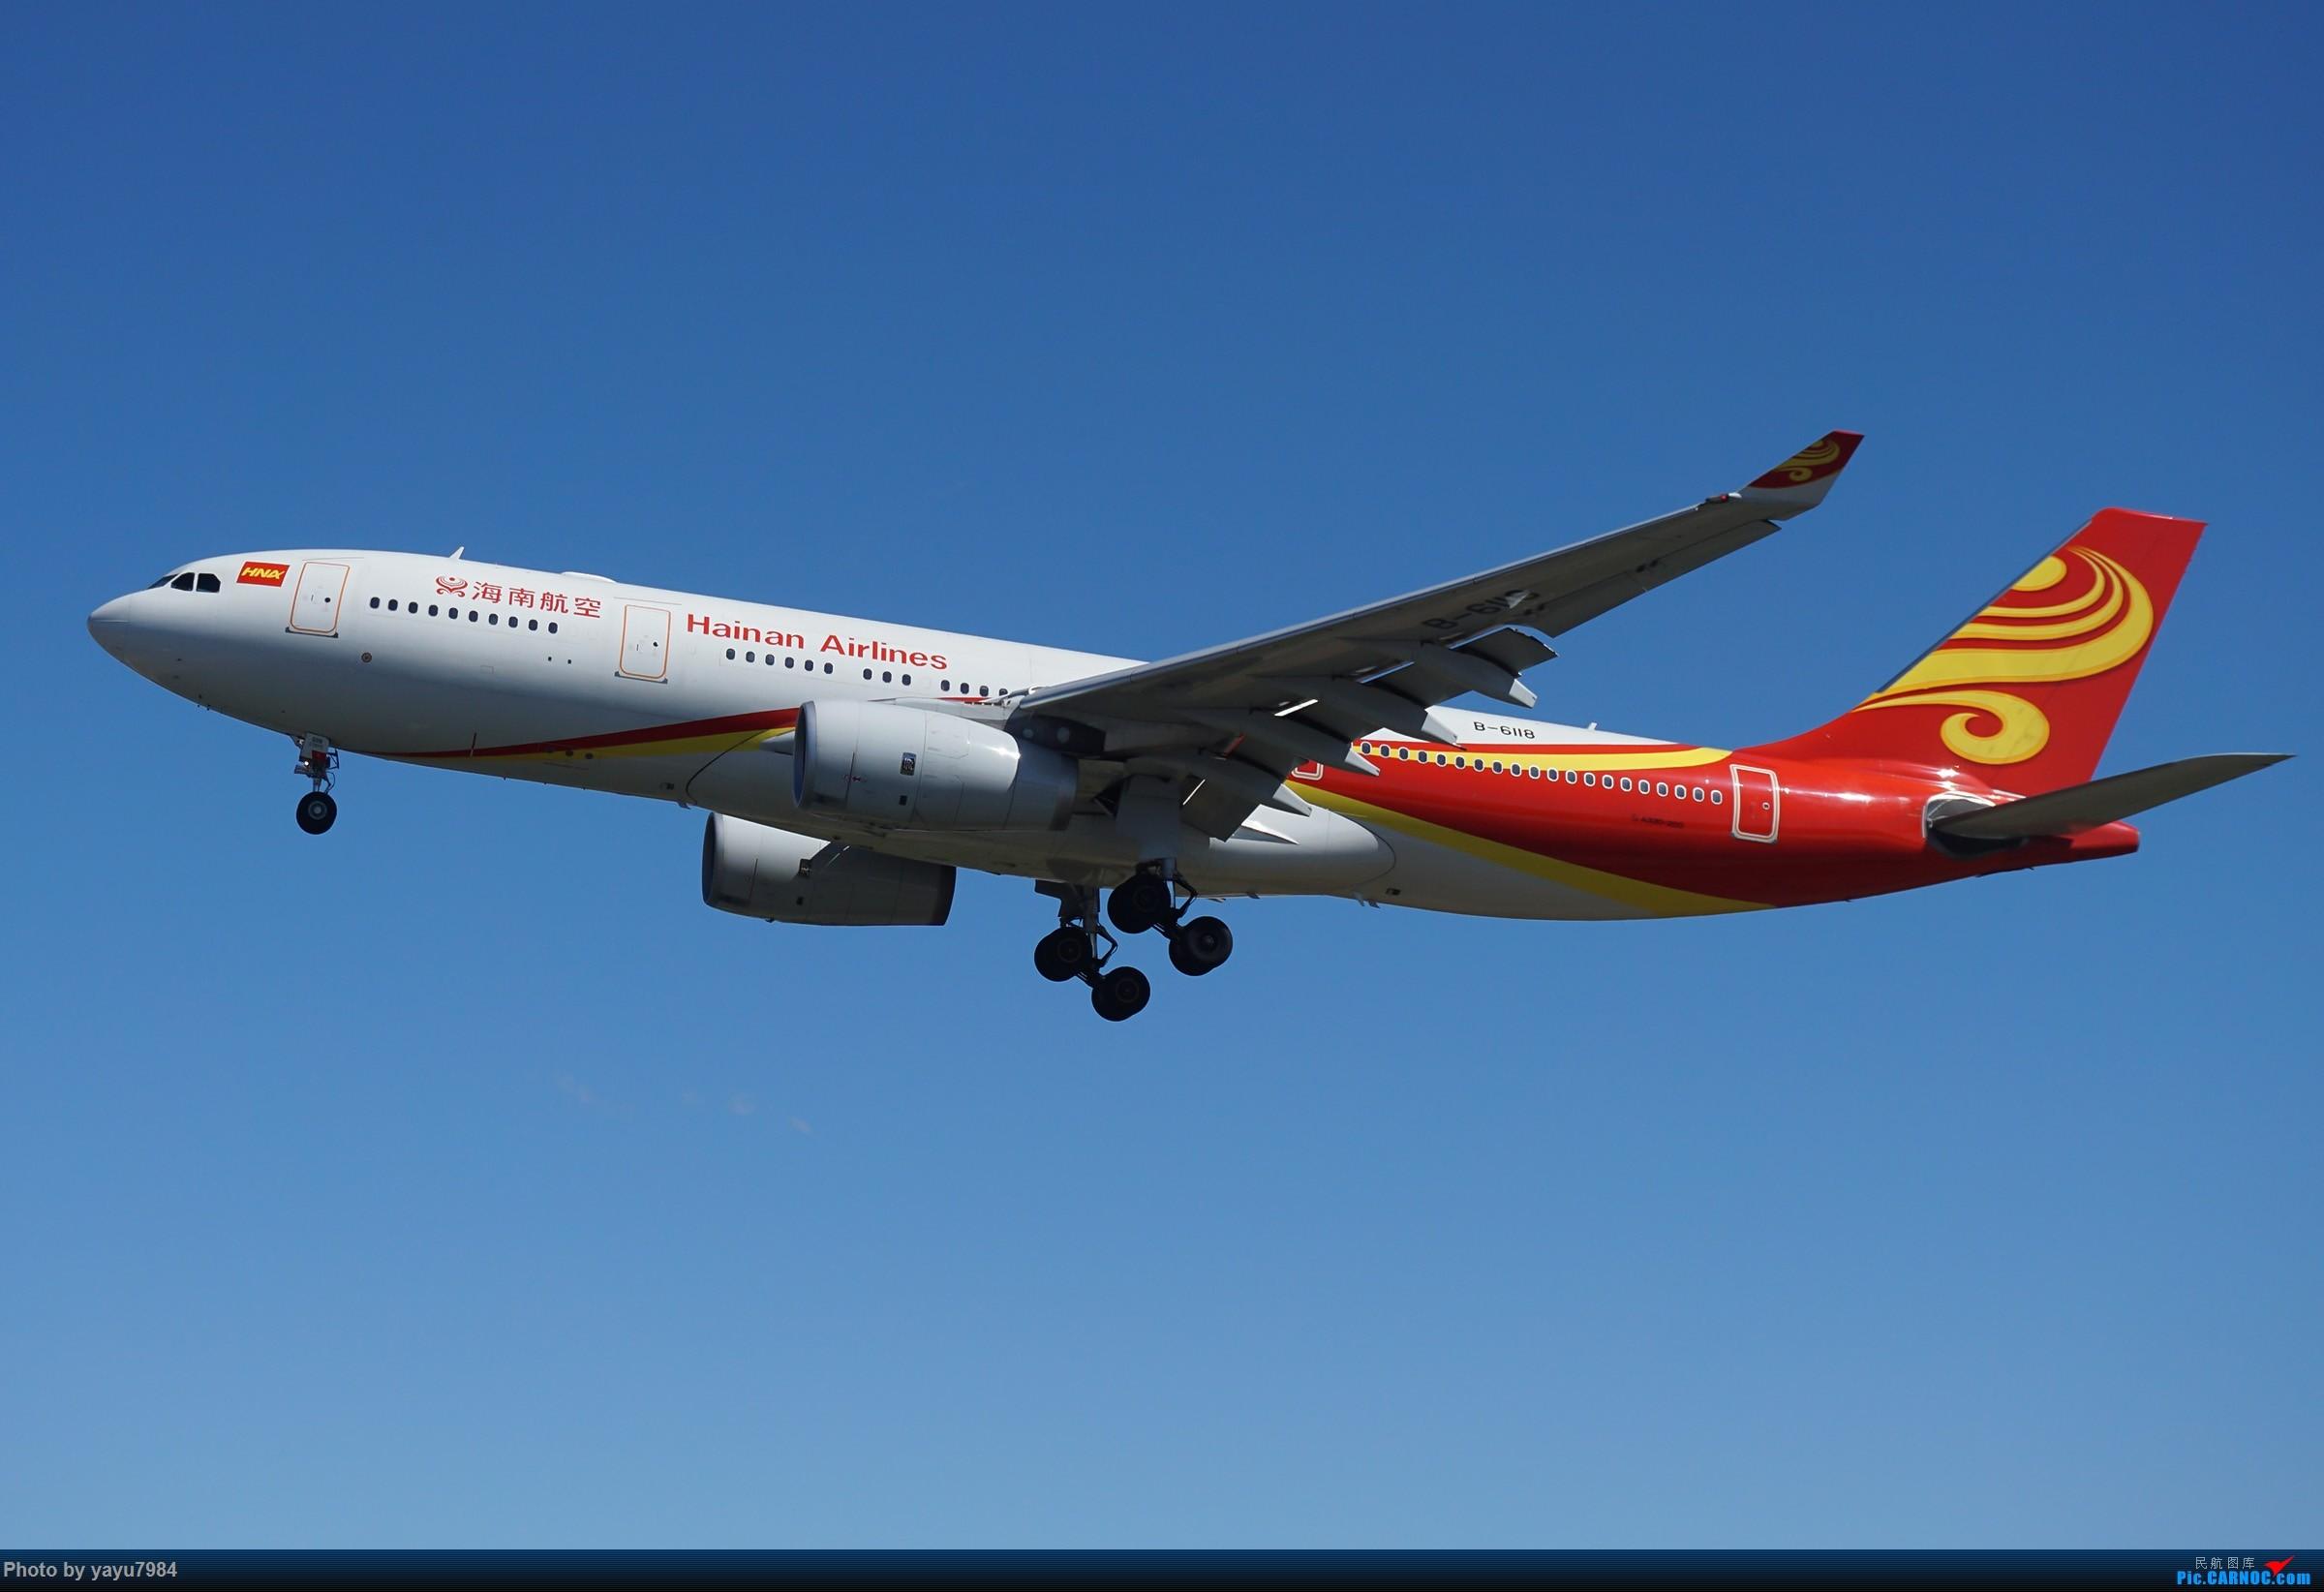 Re:[原创][SYD] 东航天合332,雪绒花343,华航蓝鹊,以及其他日常货 AIRBUS A330-200 B-6118 澳大利亚悉尼金斯福德·史密斯机场